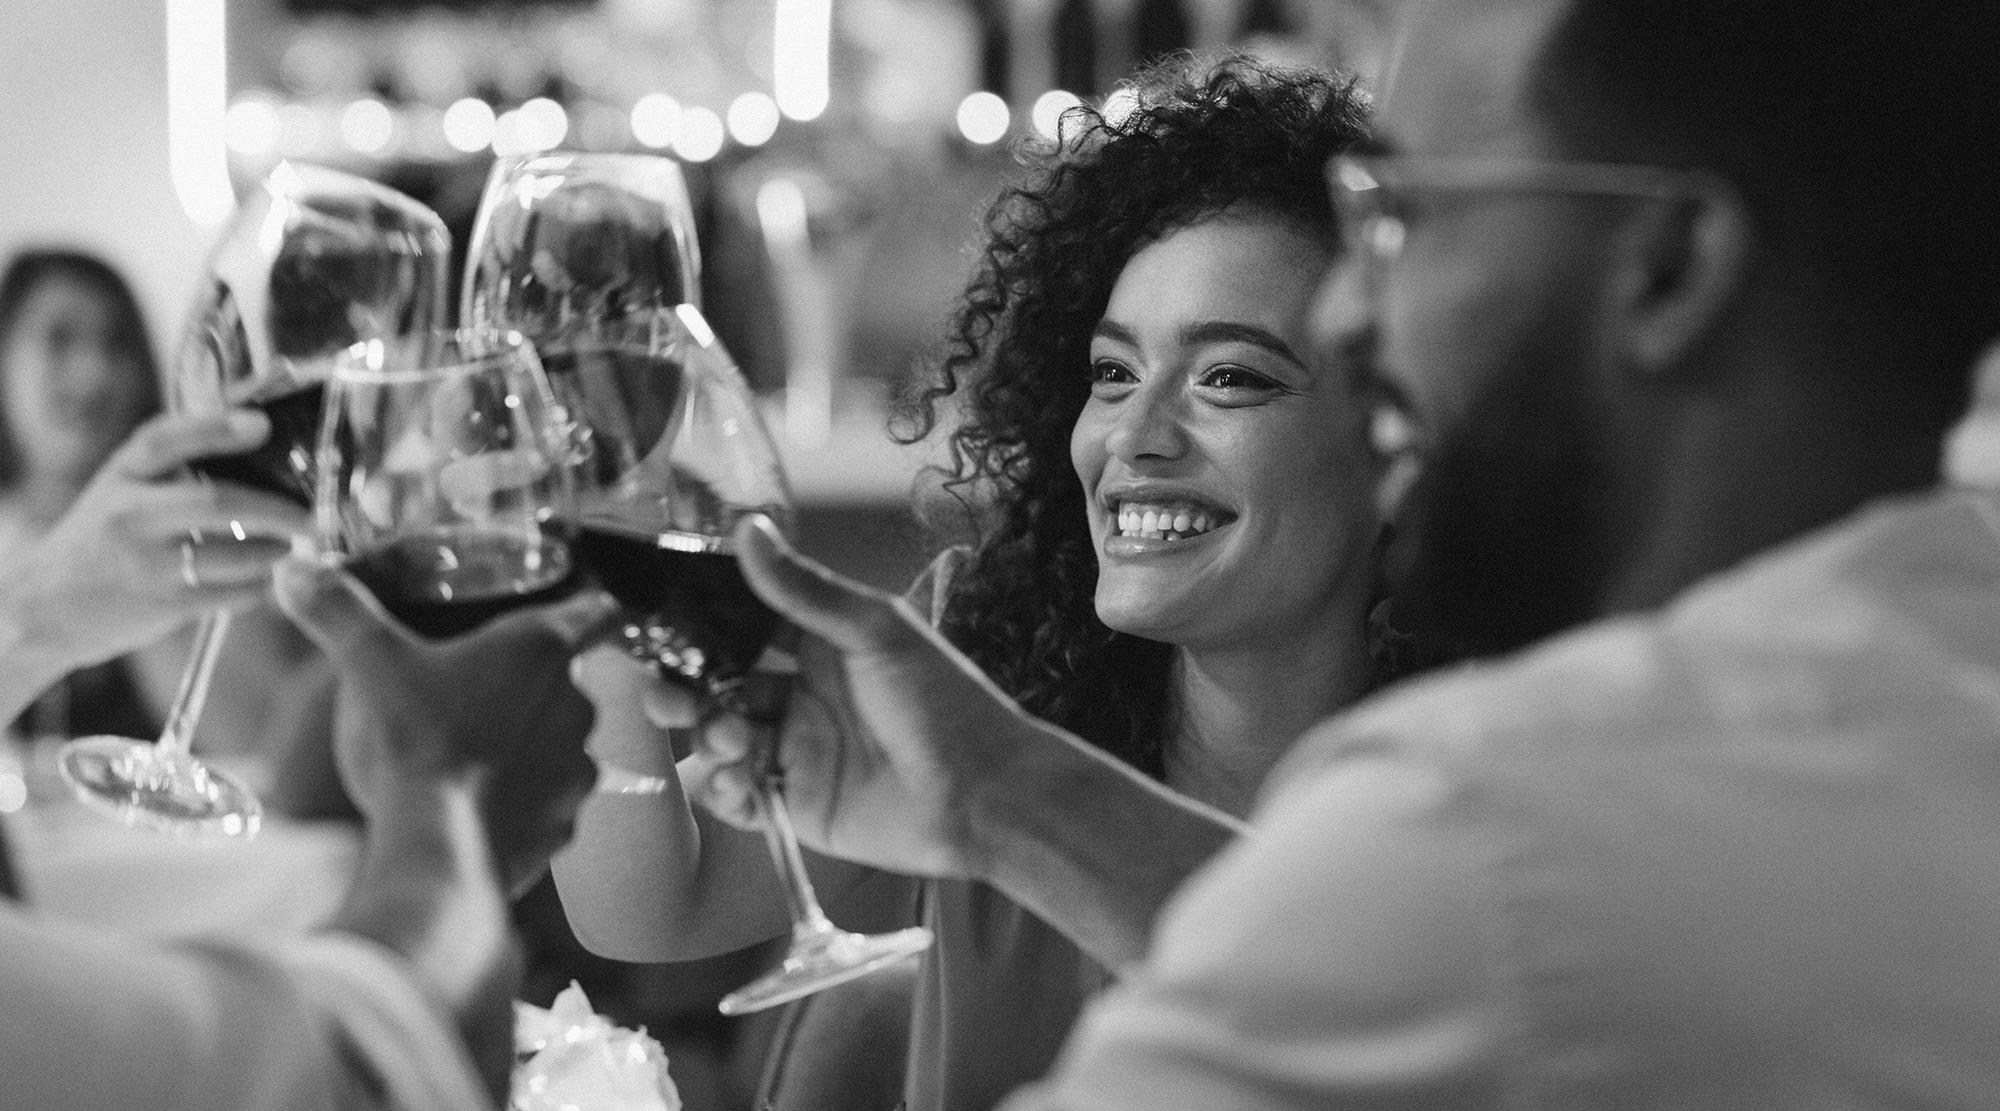 Azara friends making a toast